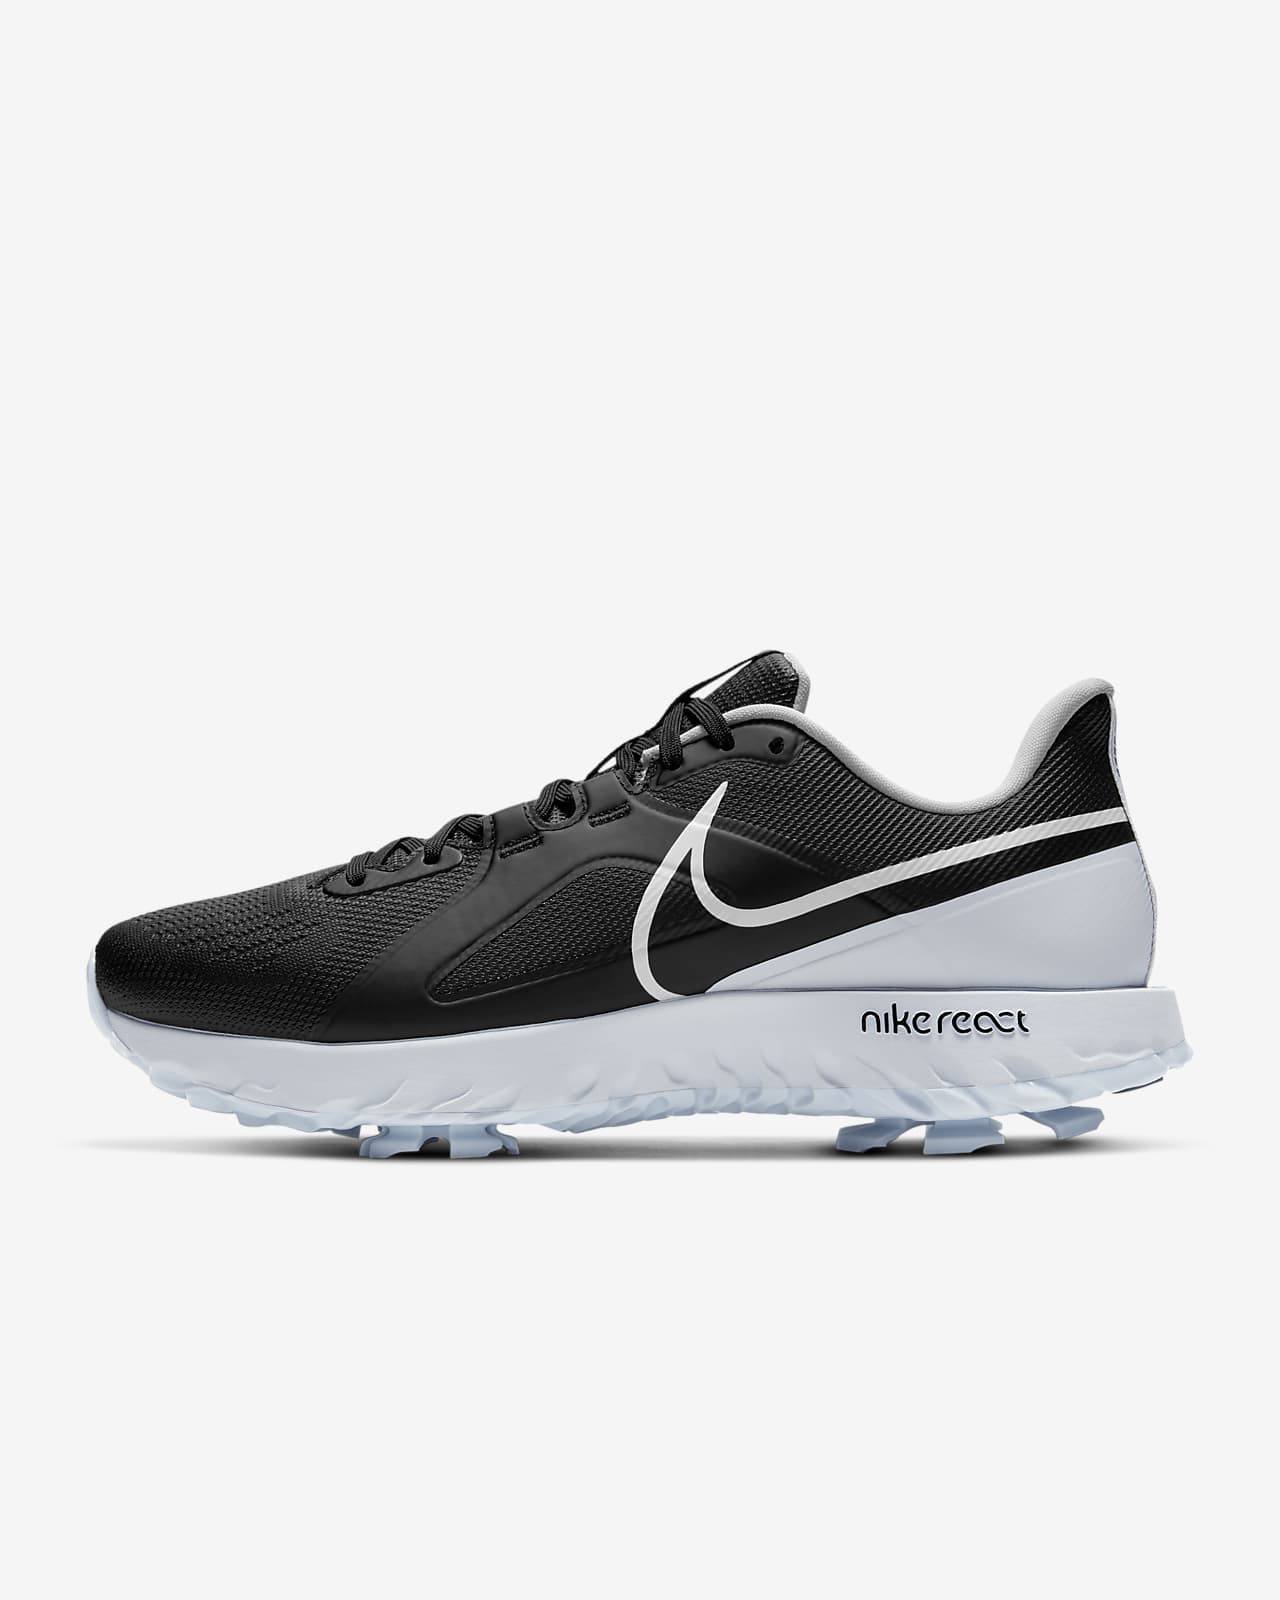 Buty do golfa Nike React Infinity Pro